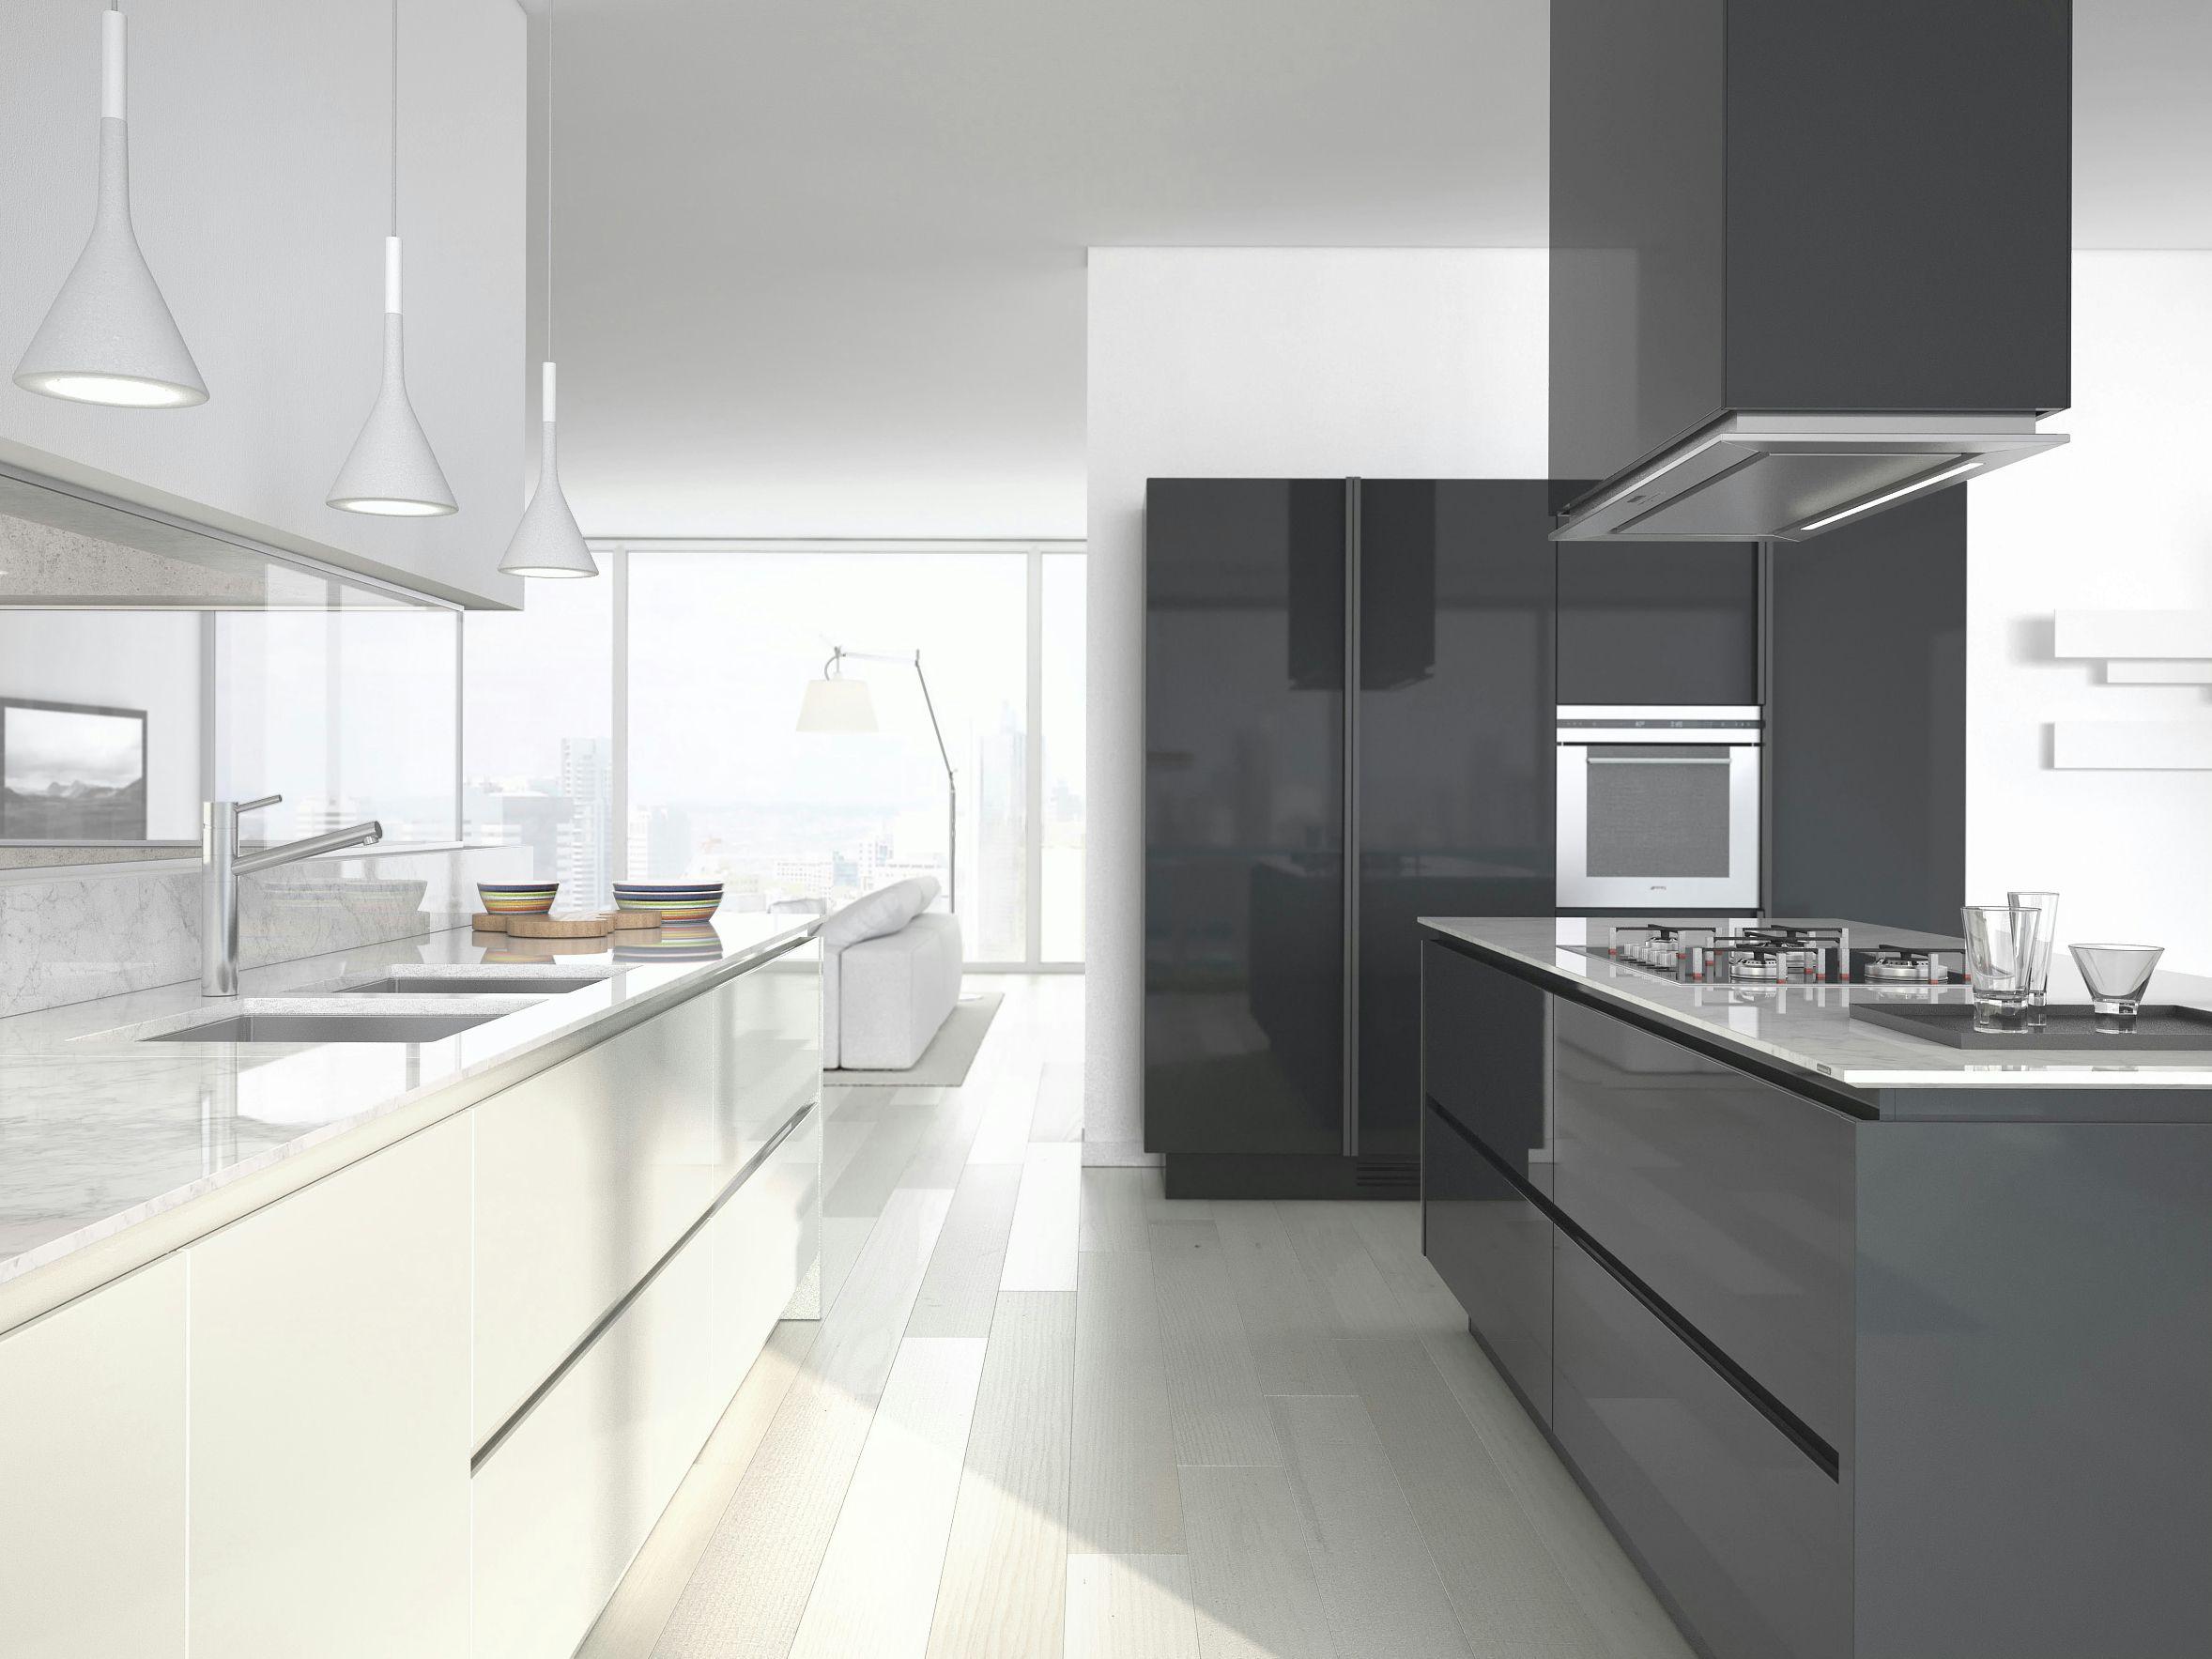 Beautiful cucine moderne per mansarde cucine moderne per mansarde pin cucine with cucine per - Cucine per mansarde basse ...